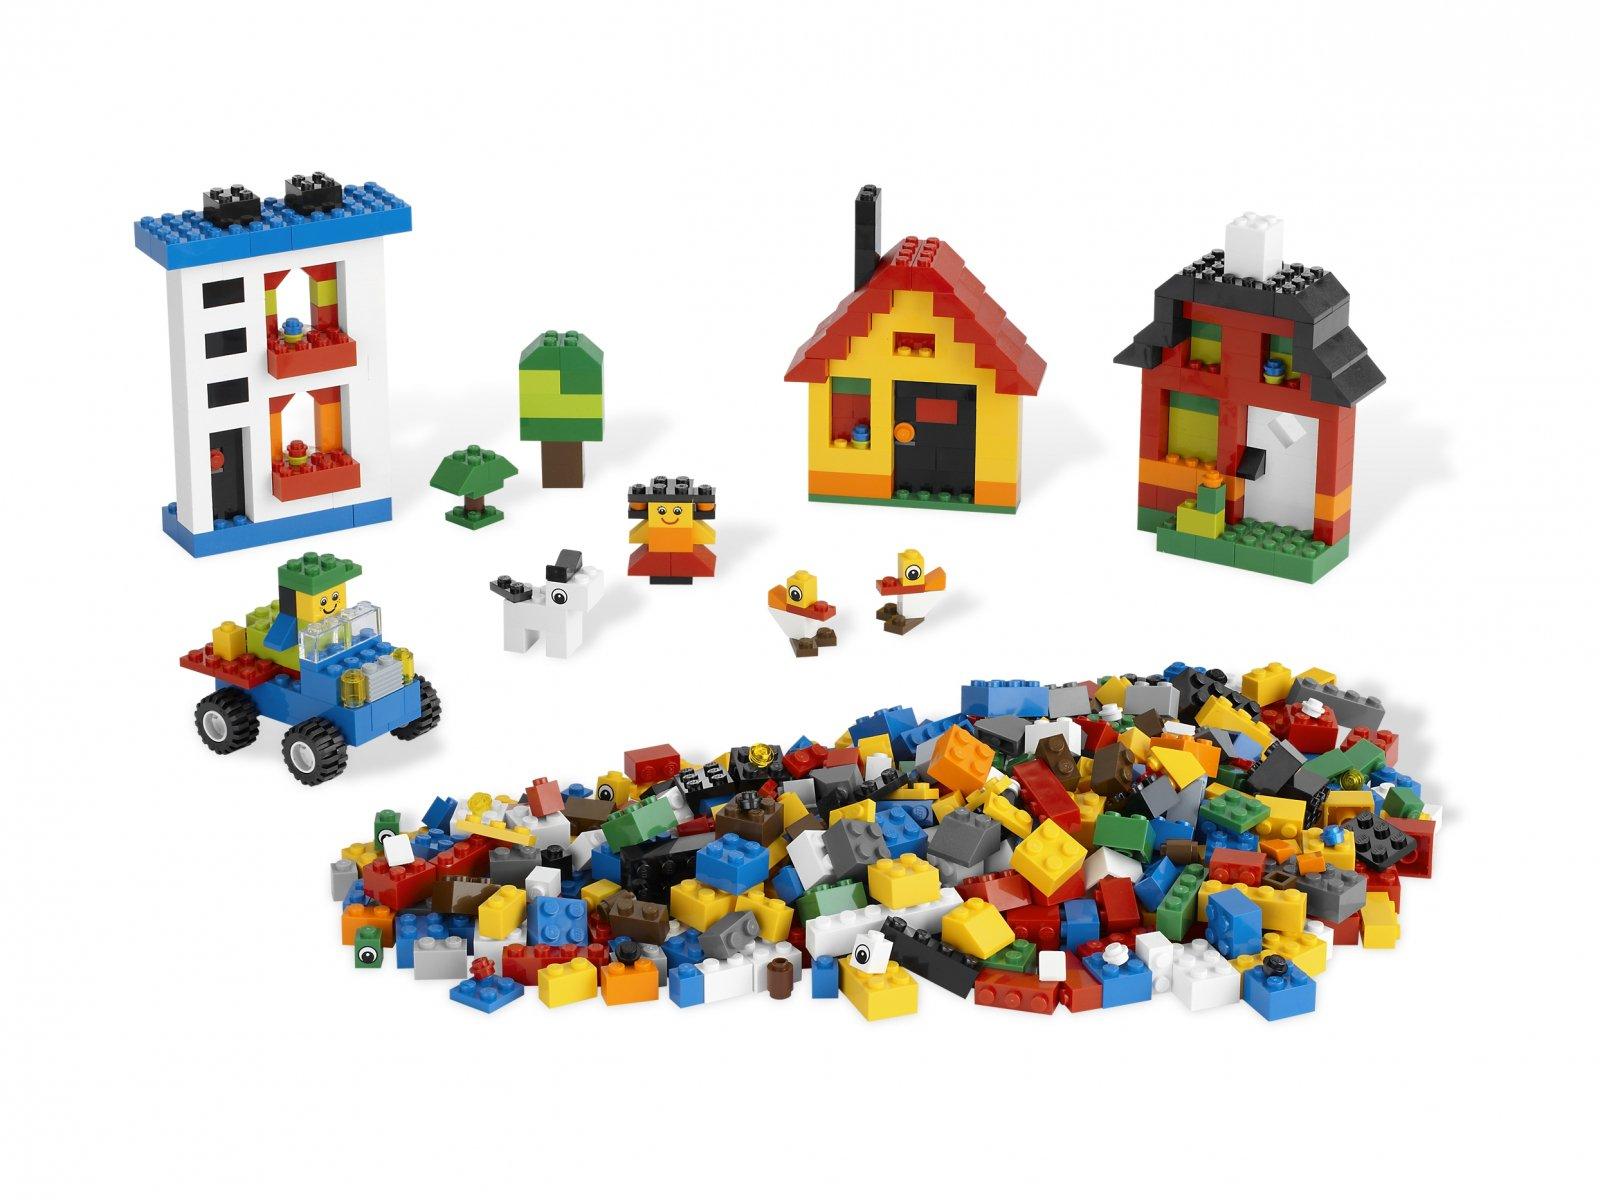 LEGO Bricks & More Creative Building Kit 5749